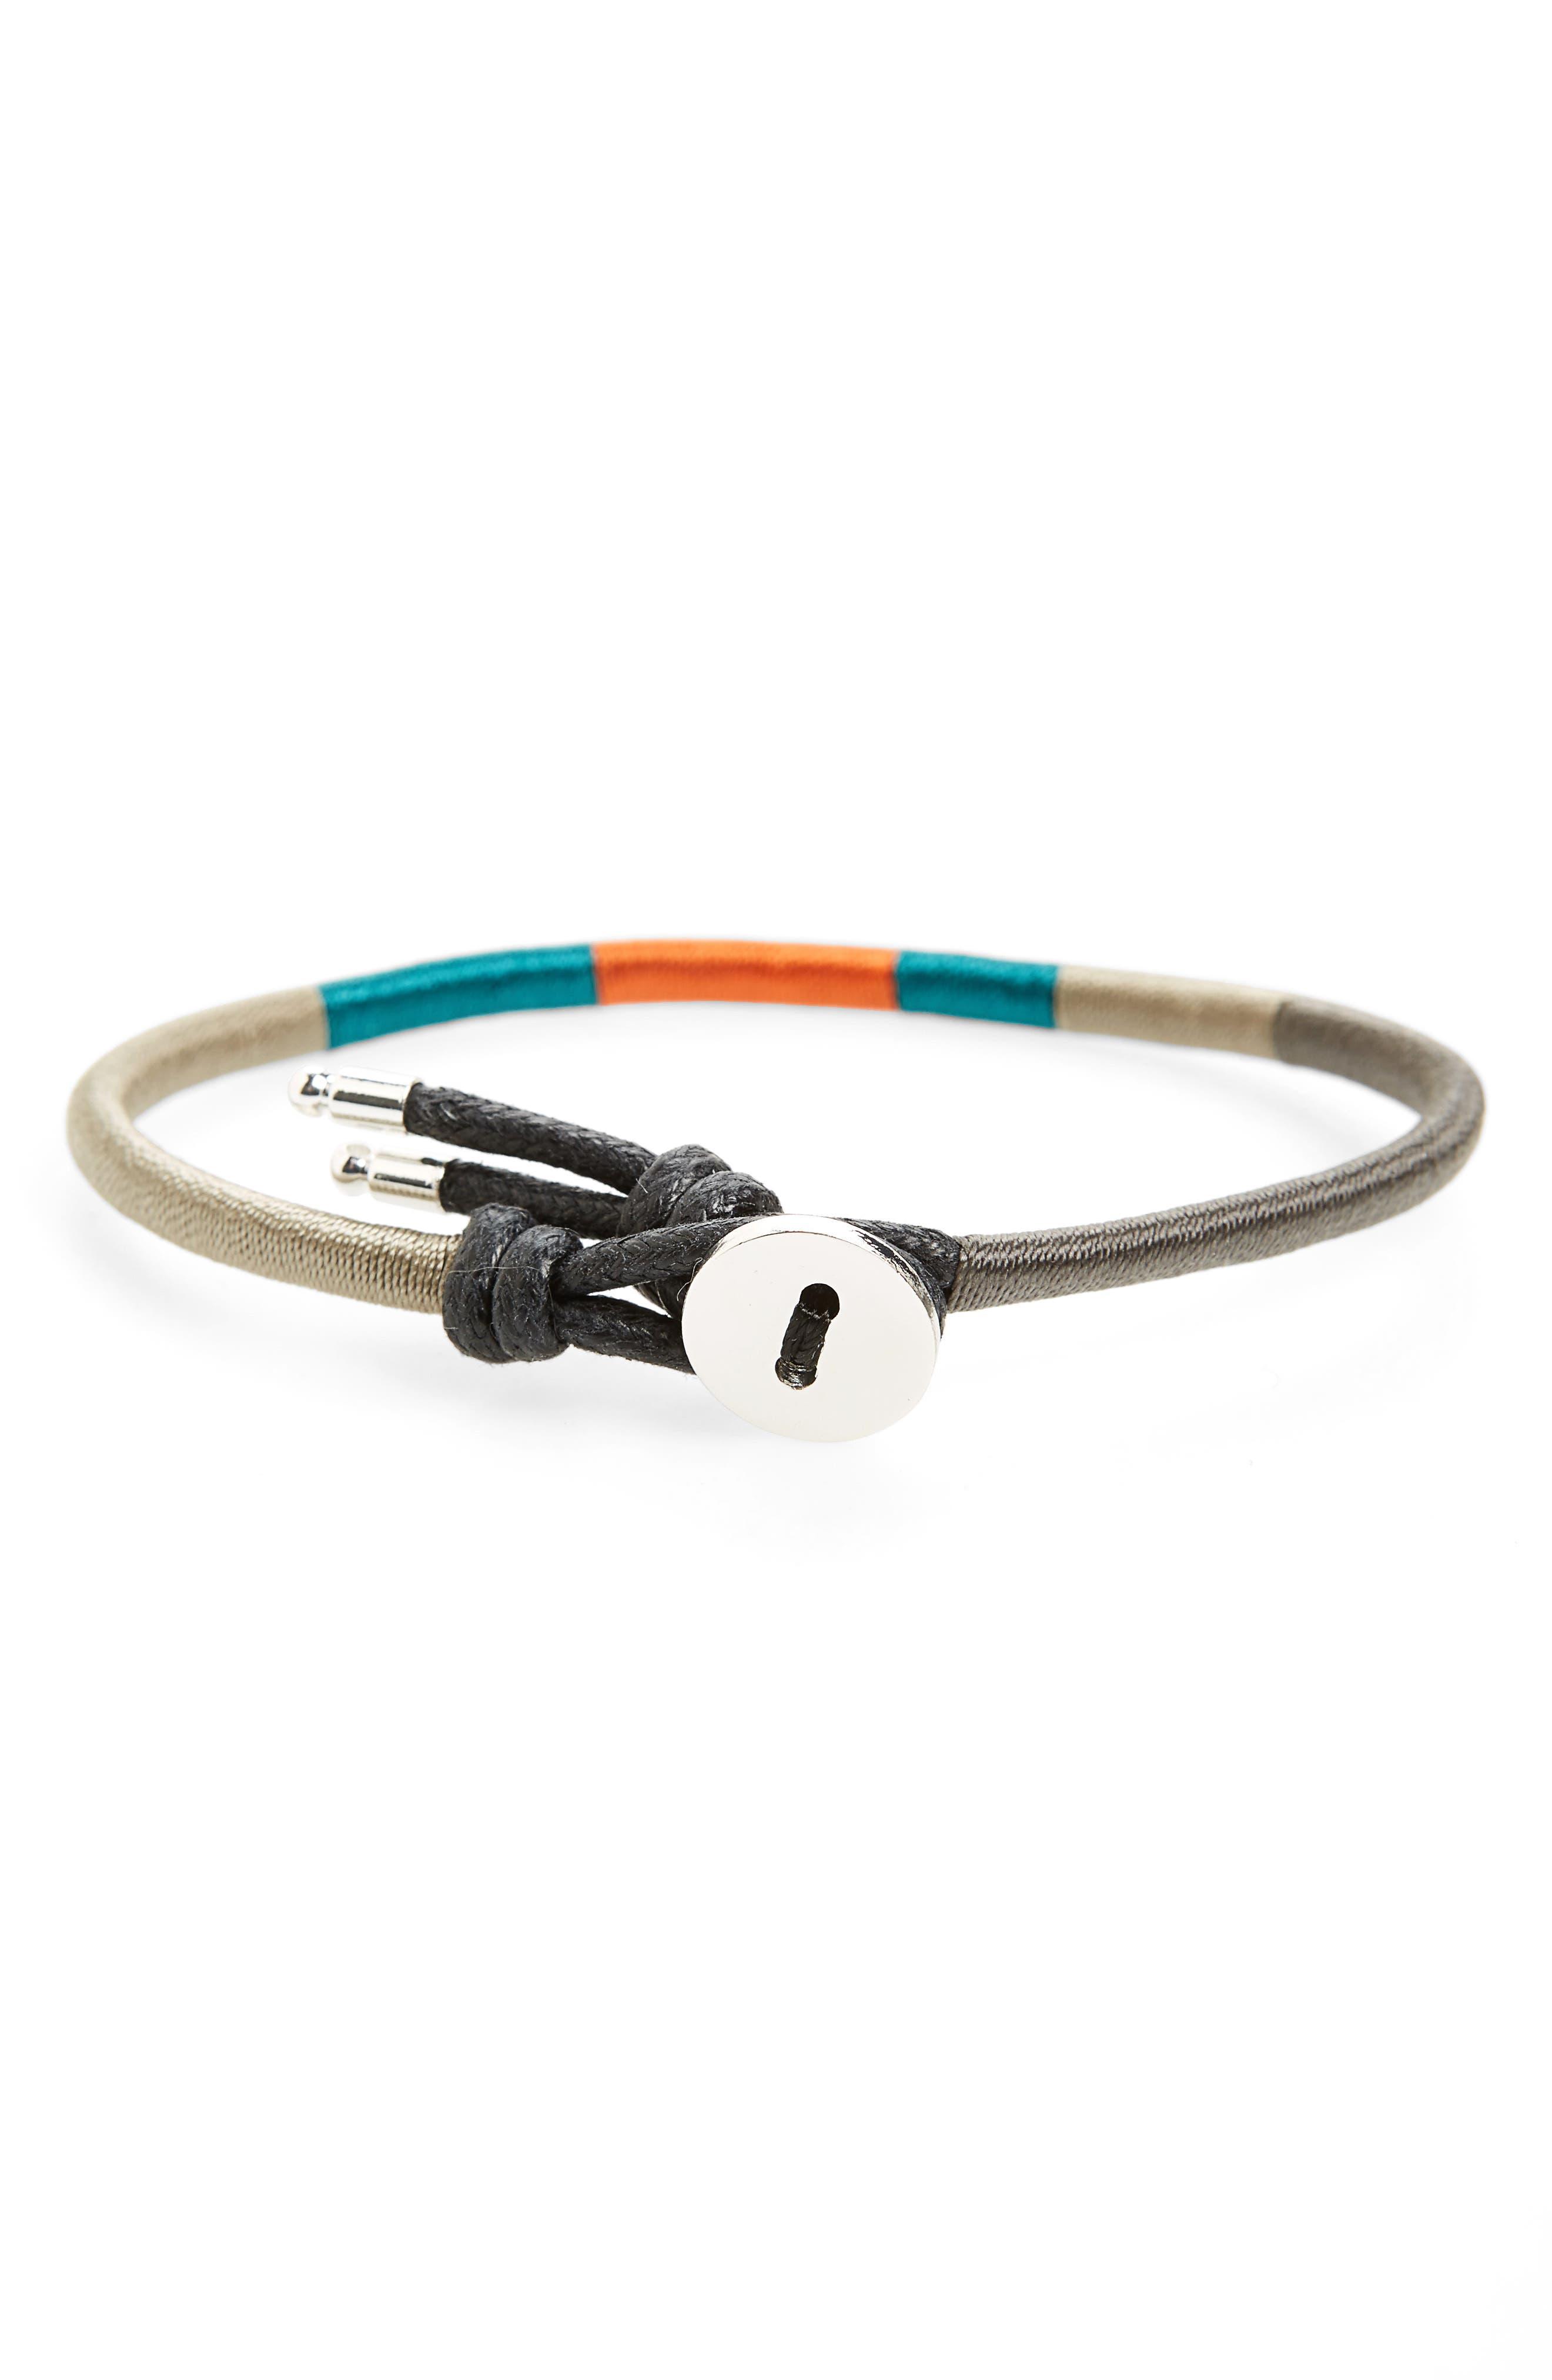 Finn & Taylor Woven Bracelet,                             Main thumbnail 1, color,                             Black/ Grey/ Green/ Orange